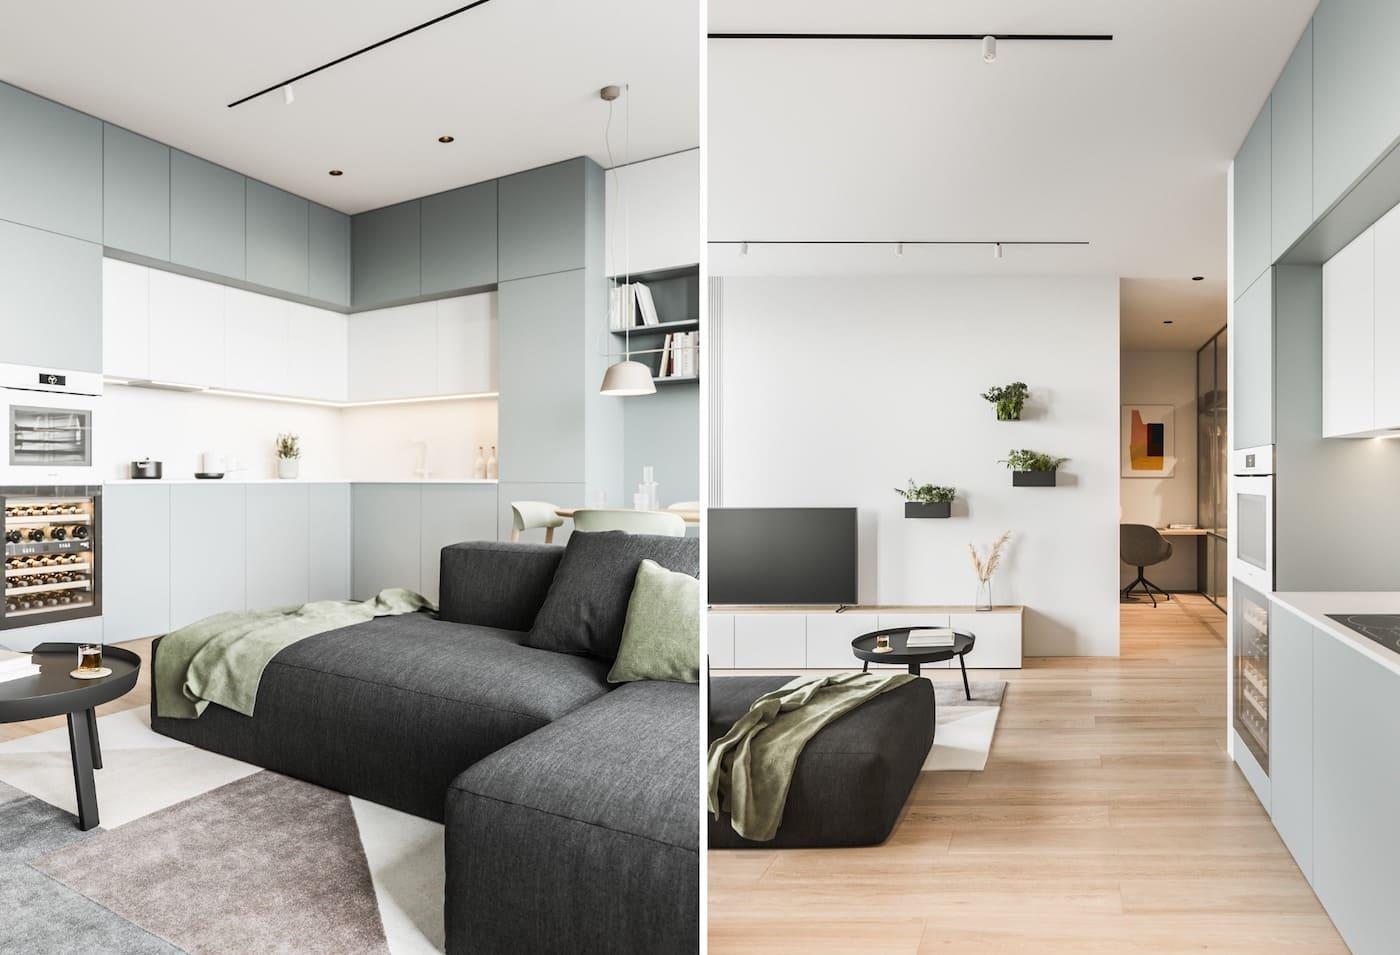 дизайн интерьера модной квартиры фото 48